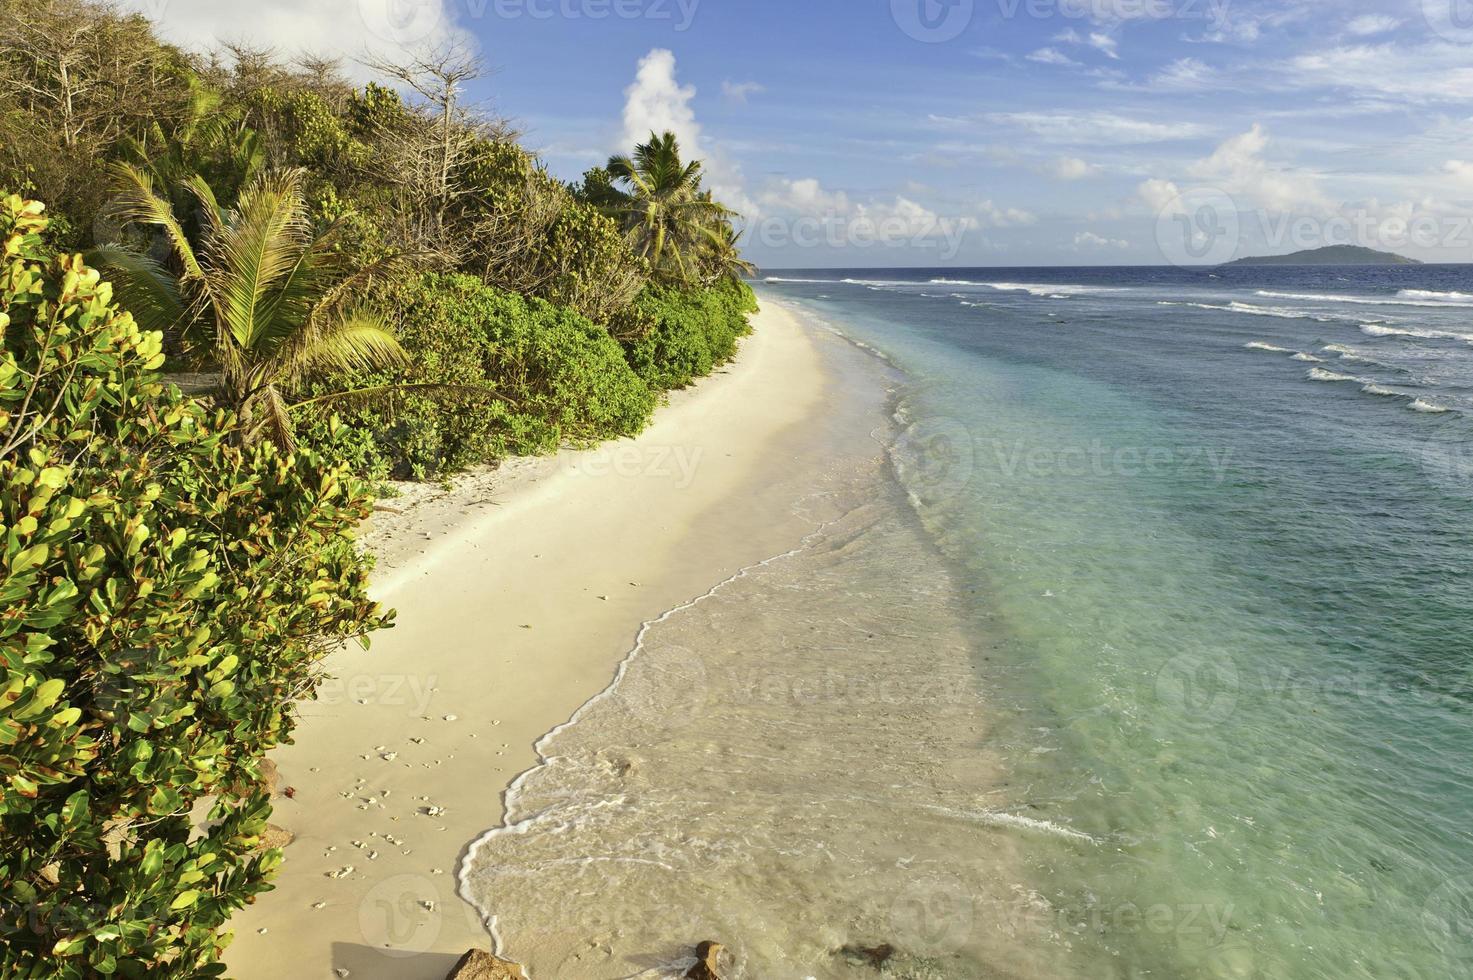 verlaten tropisch eiland strand turquoise oceaan lagune palmbomen foto